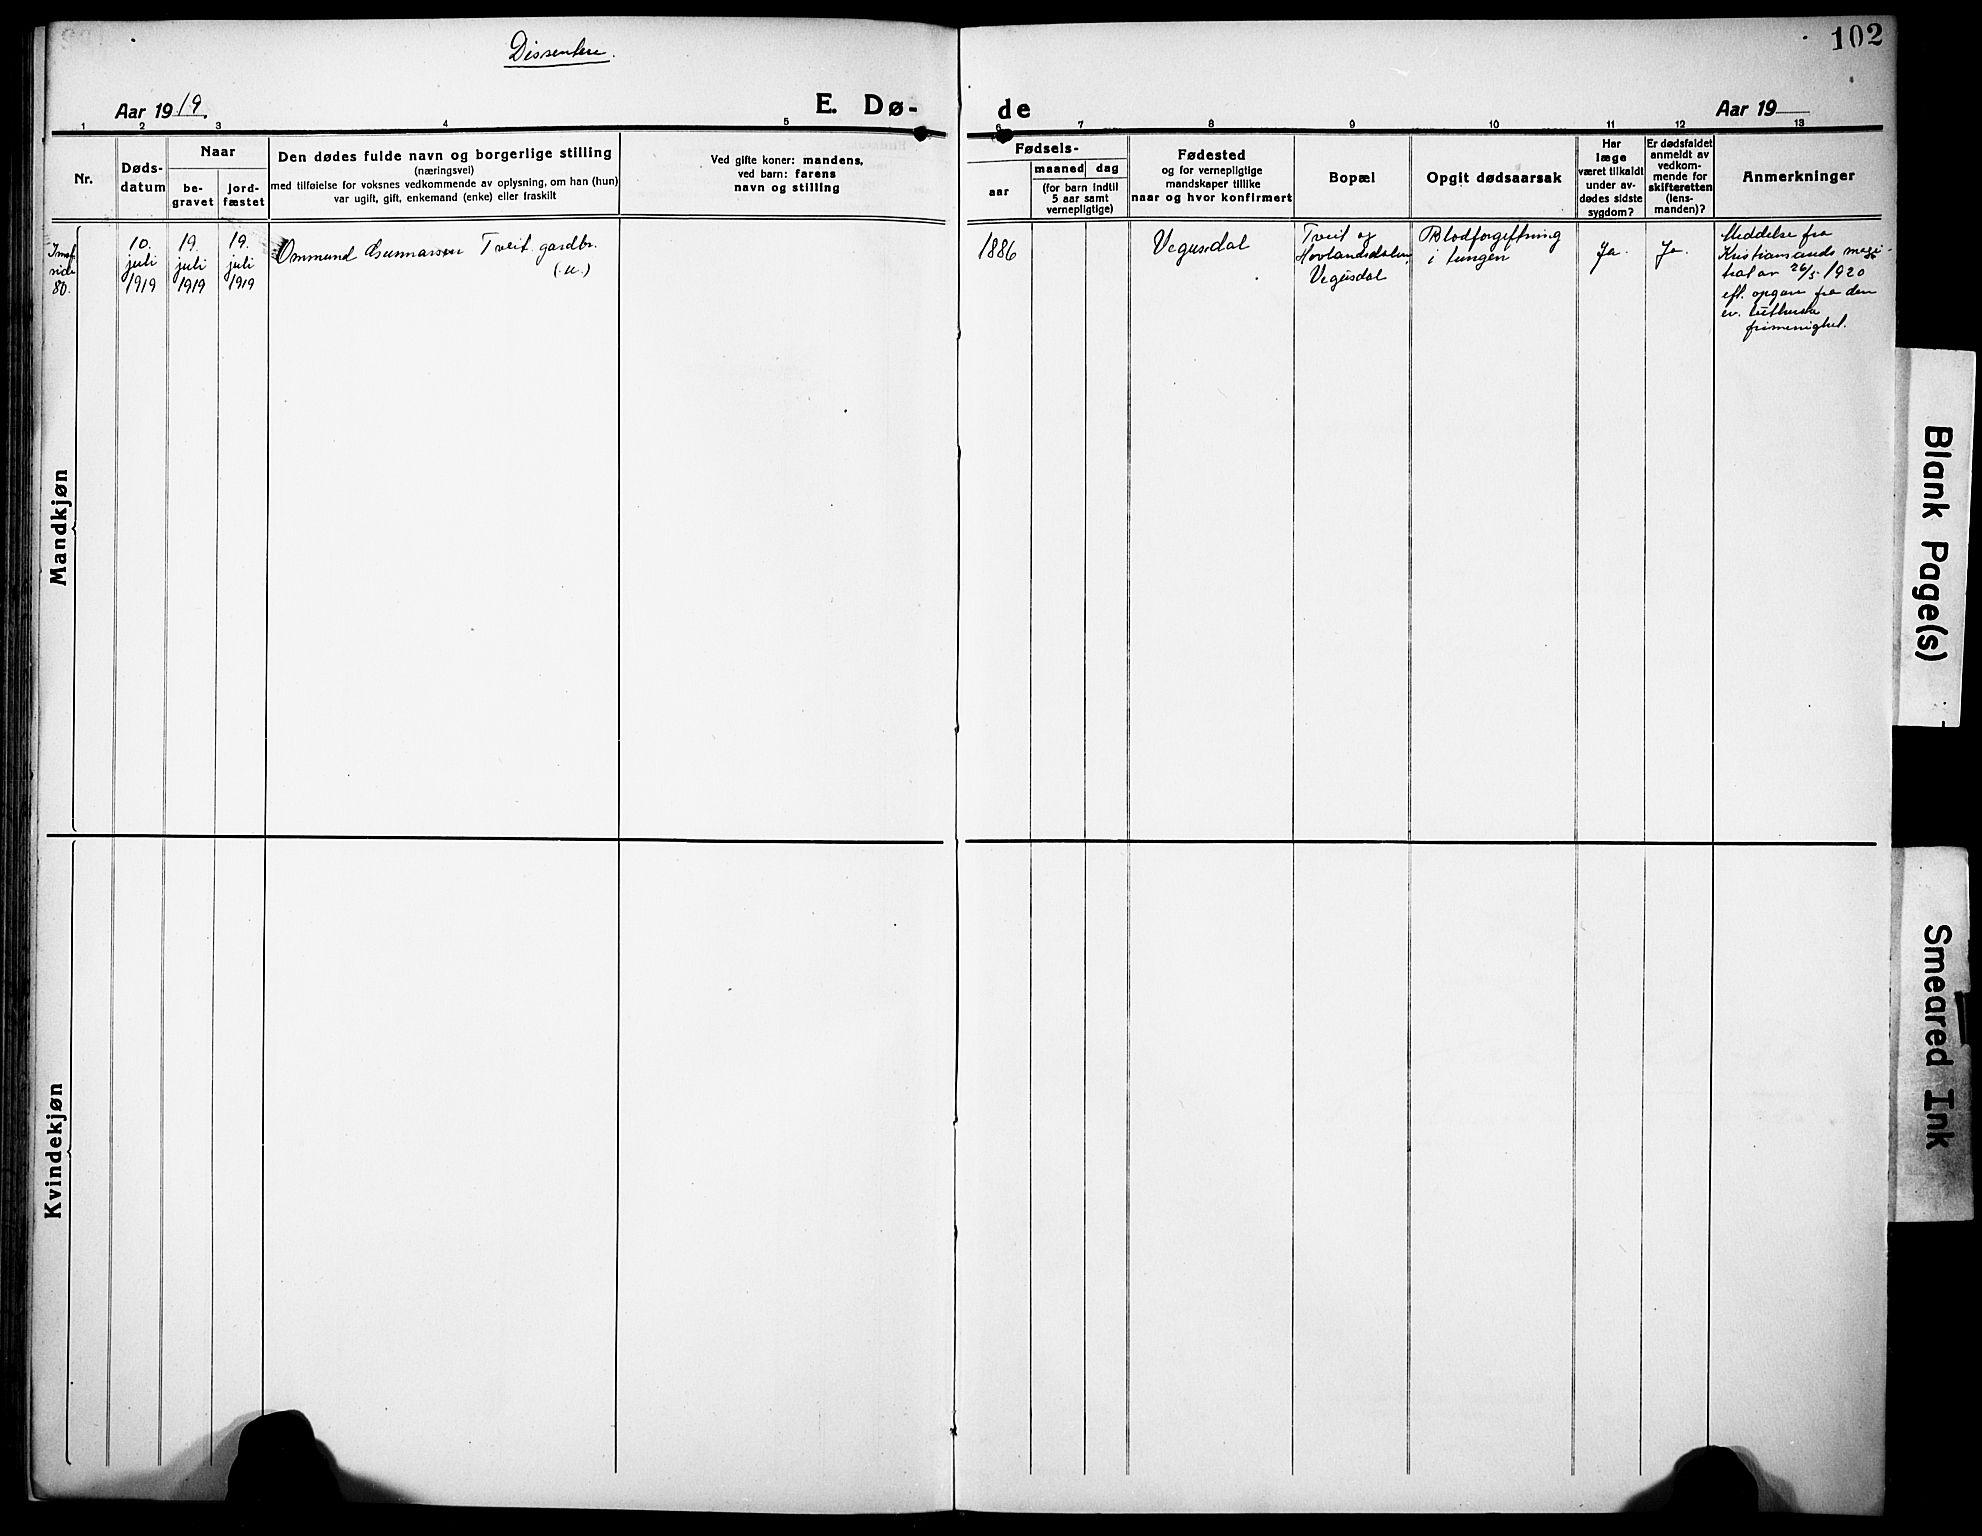 SAK, Herefoss sokneprestkontor, F/Fb/Fbb/L0004: Klokkerbok nr. B 4, 1917-1933, s. 93